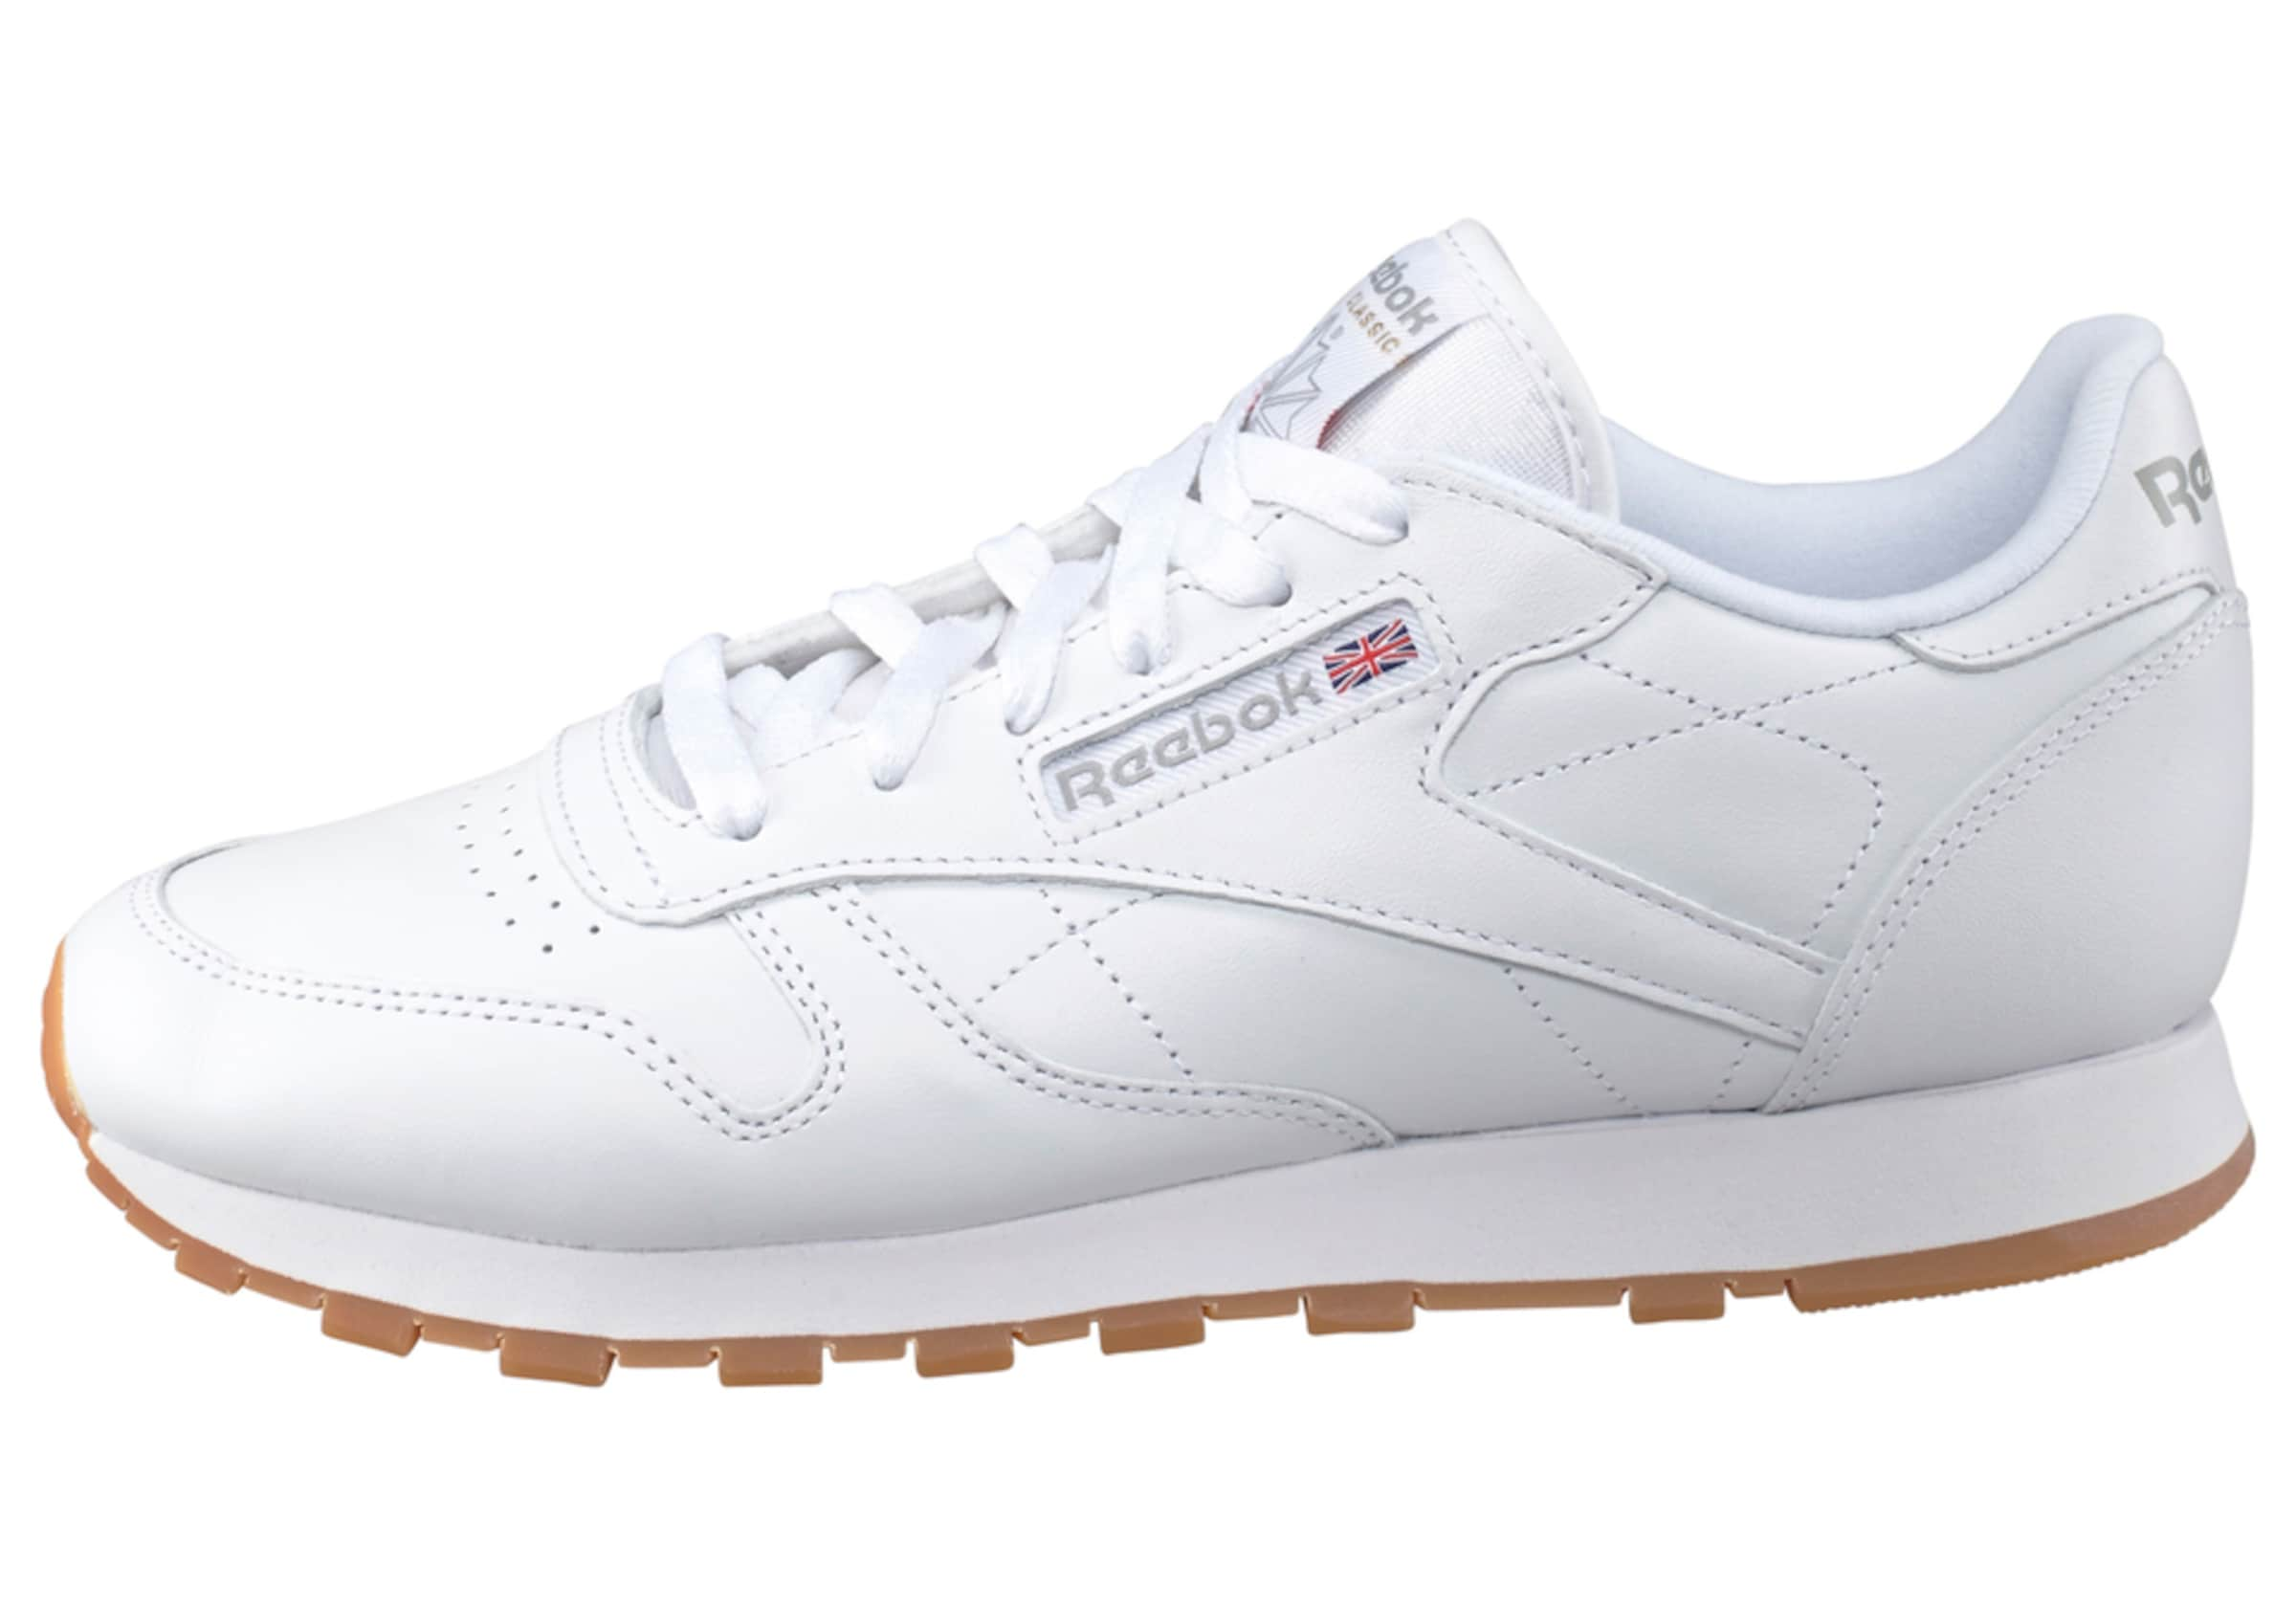 Haltbare Mode billige Schuhe Schuhe Schuhe Reebok classic | Leather Sneaker Schuhe Gut getragene Schuhe c7deaf